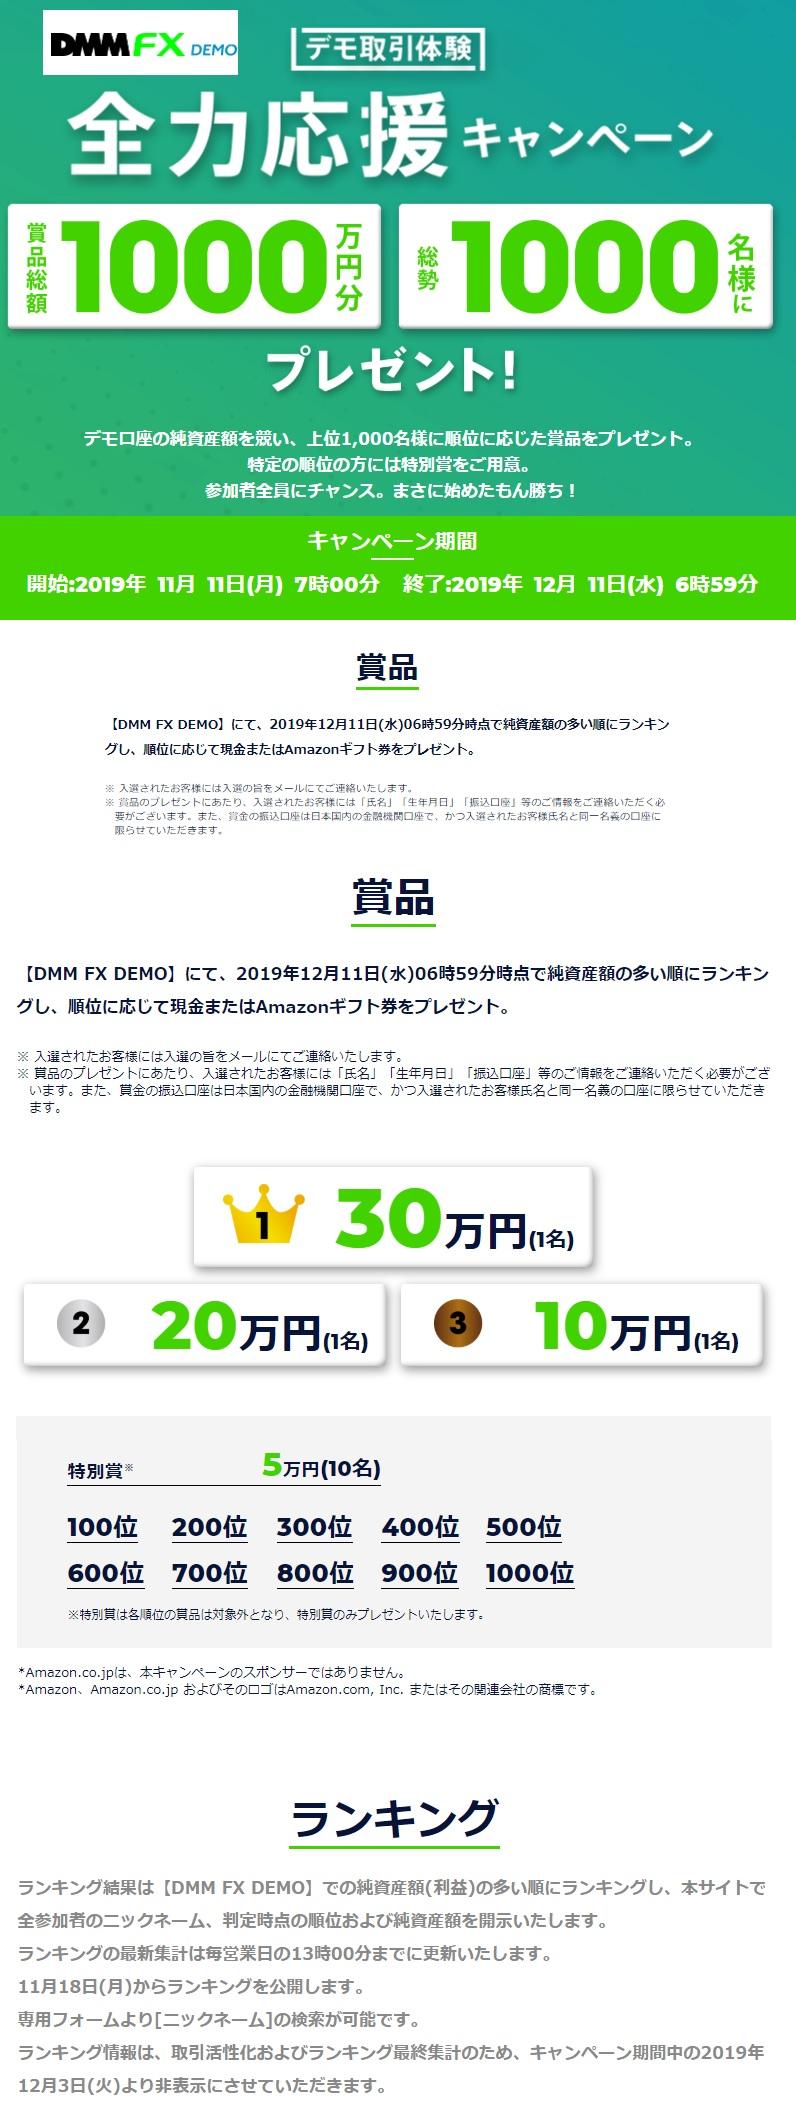 dmmfx demo キャンペーン 1000万円